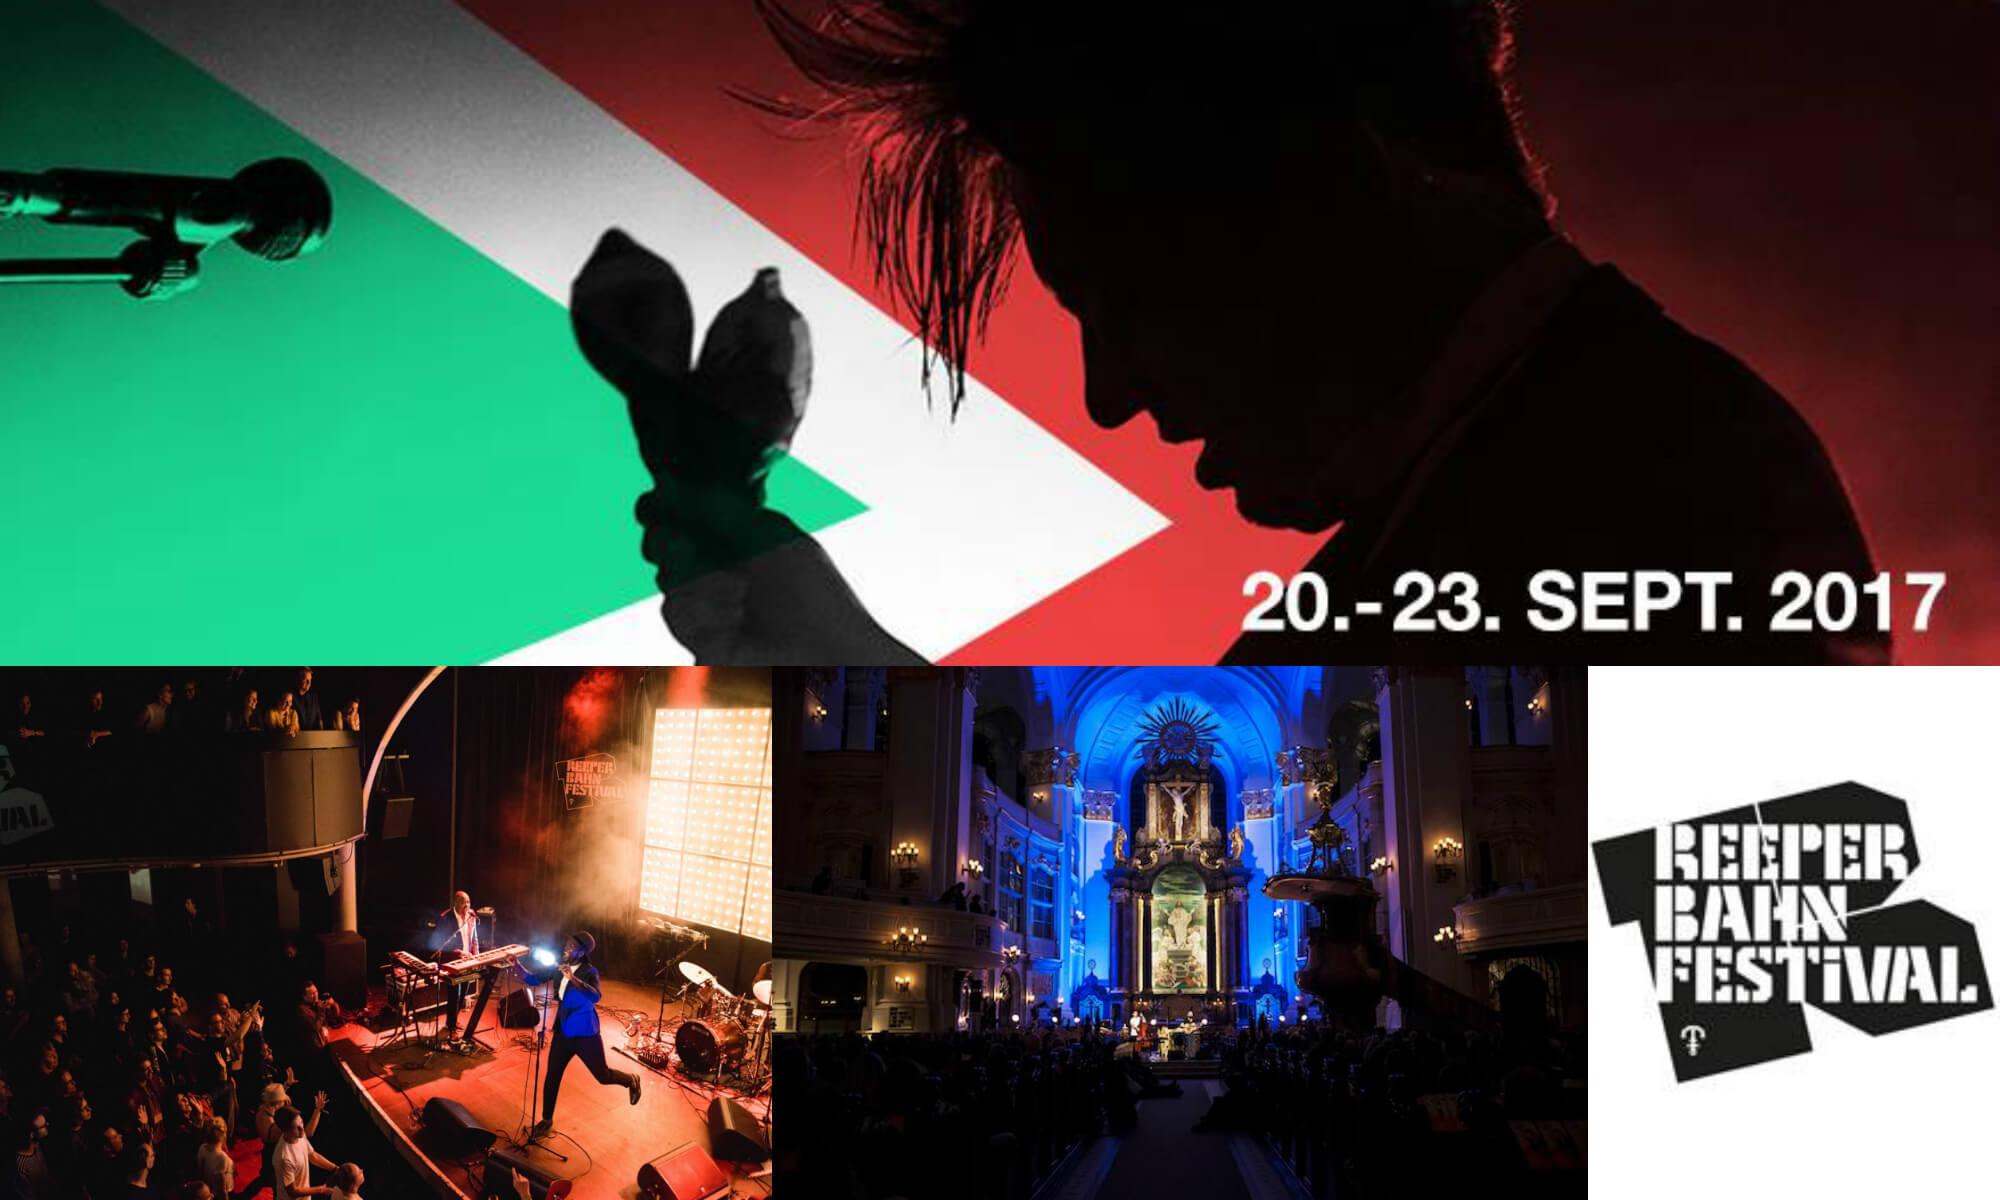 via Lena Meyer, Florian Trykowski, Reeperbahn Festival